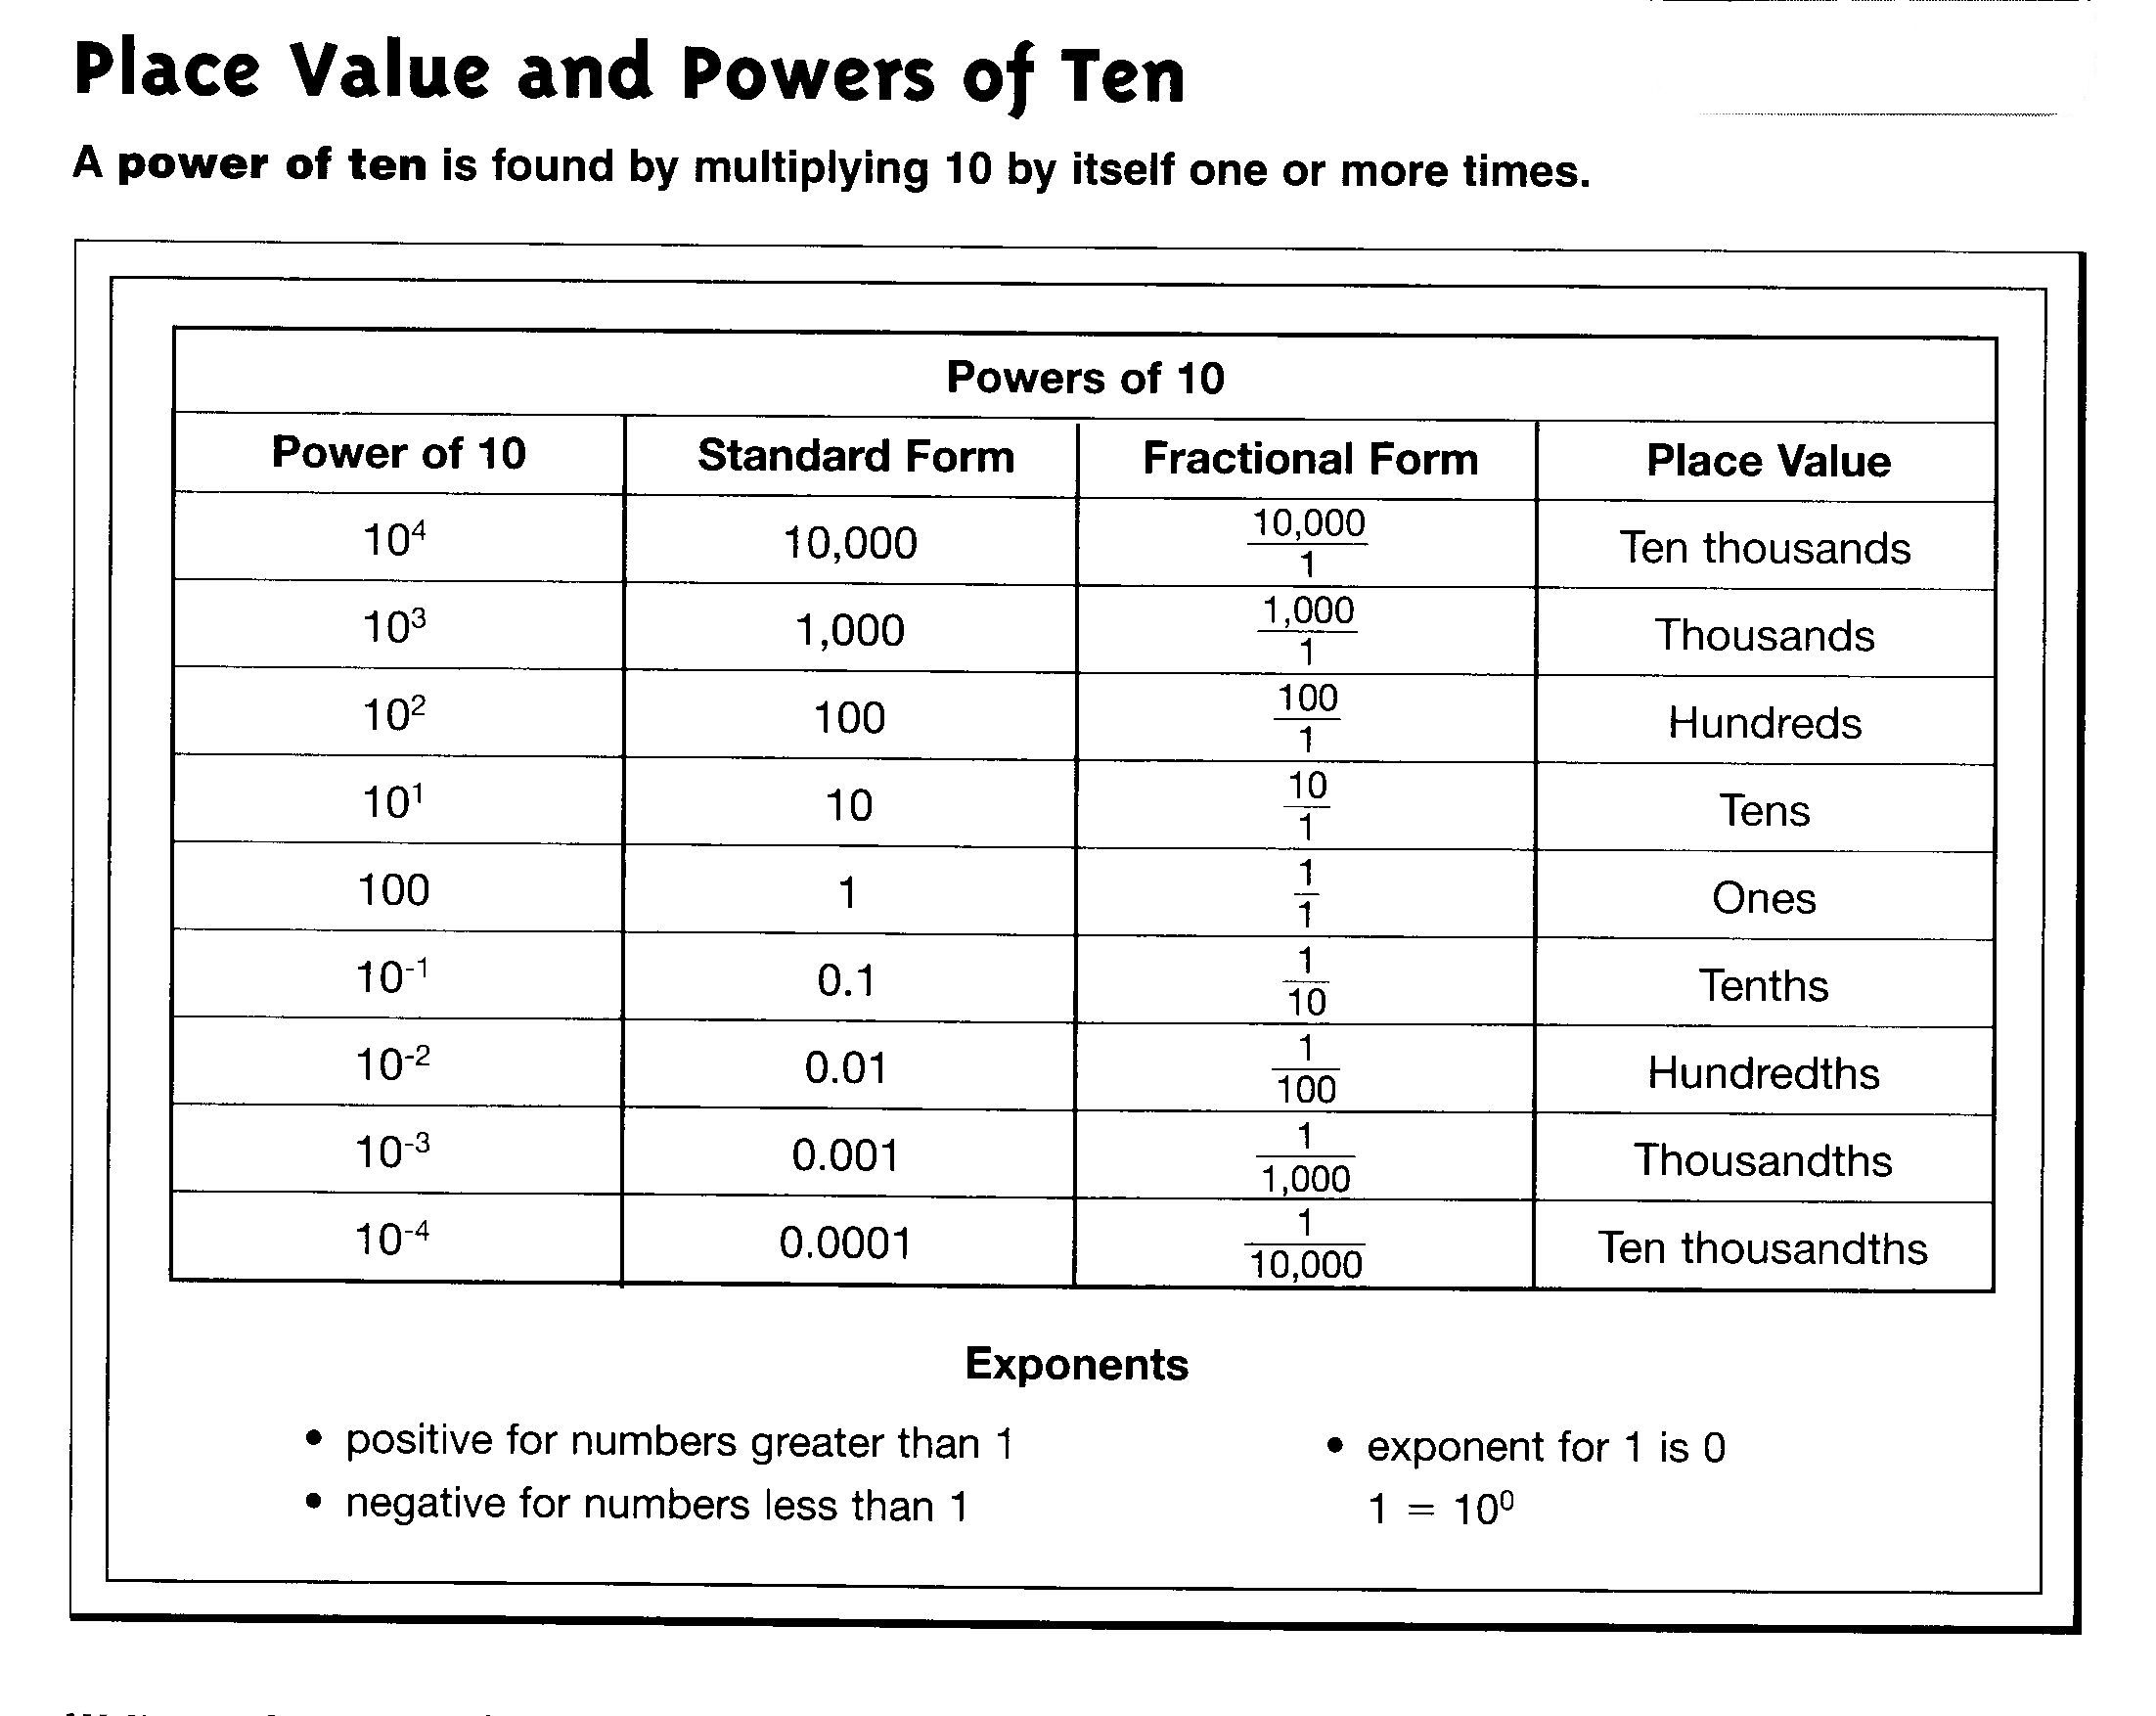 worksheet Multiplying By Powers Of 10 Worksheet powers of ten power 10 pinterest math school and ten